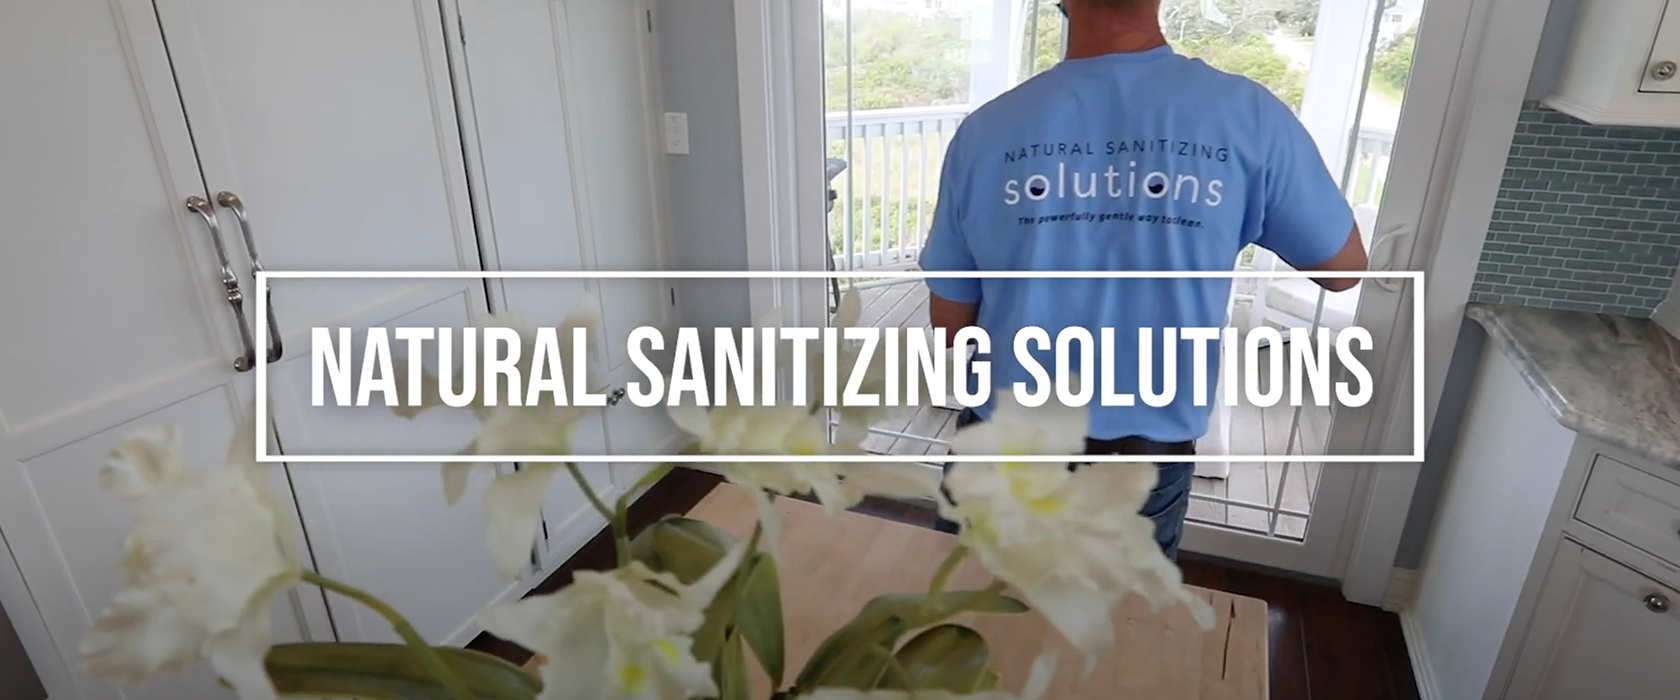 Natural Sanitizing Solutions